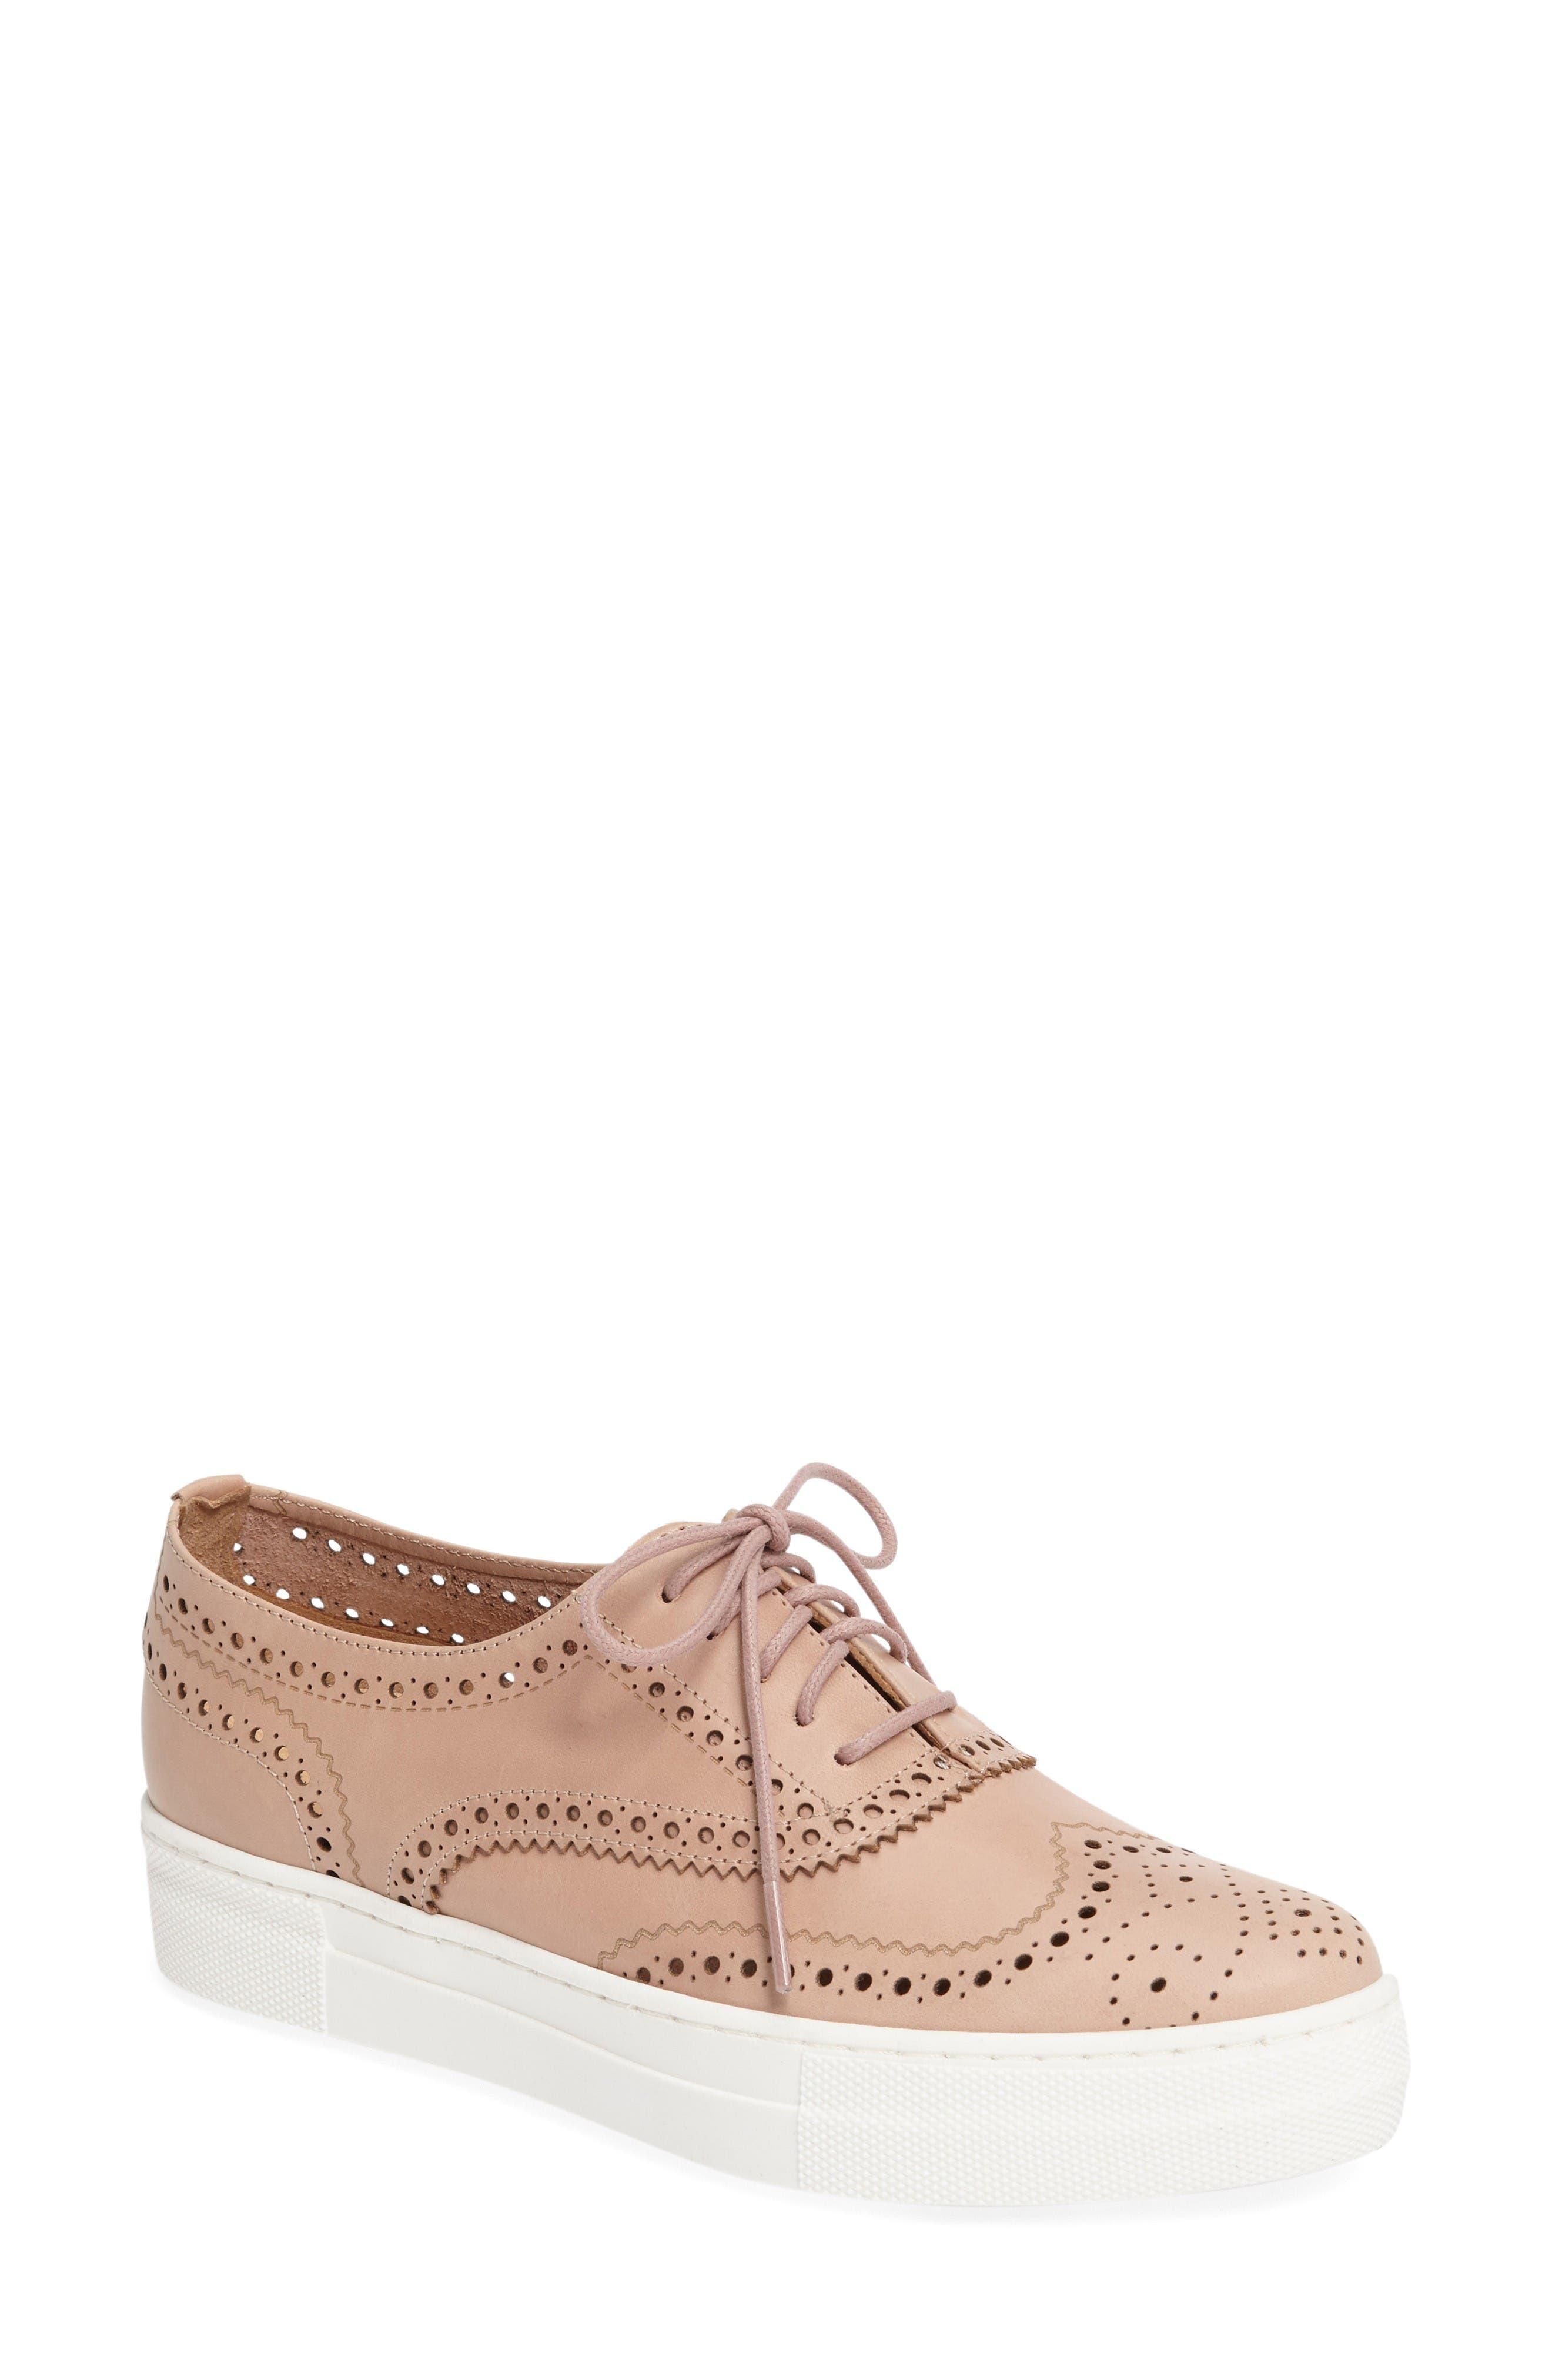 Alternate Image 1 Selected - Shellys London Kimmie Perforated Platform Sneaker (Women)